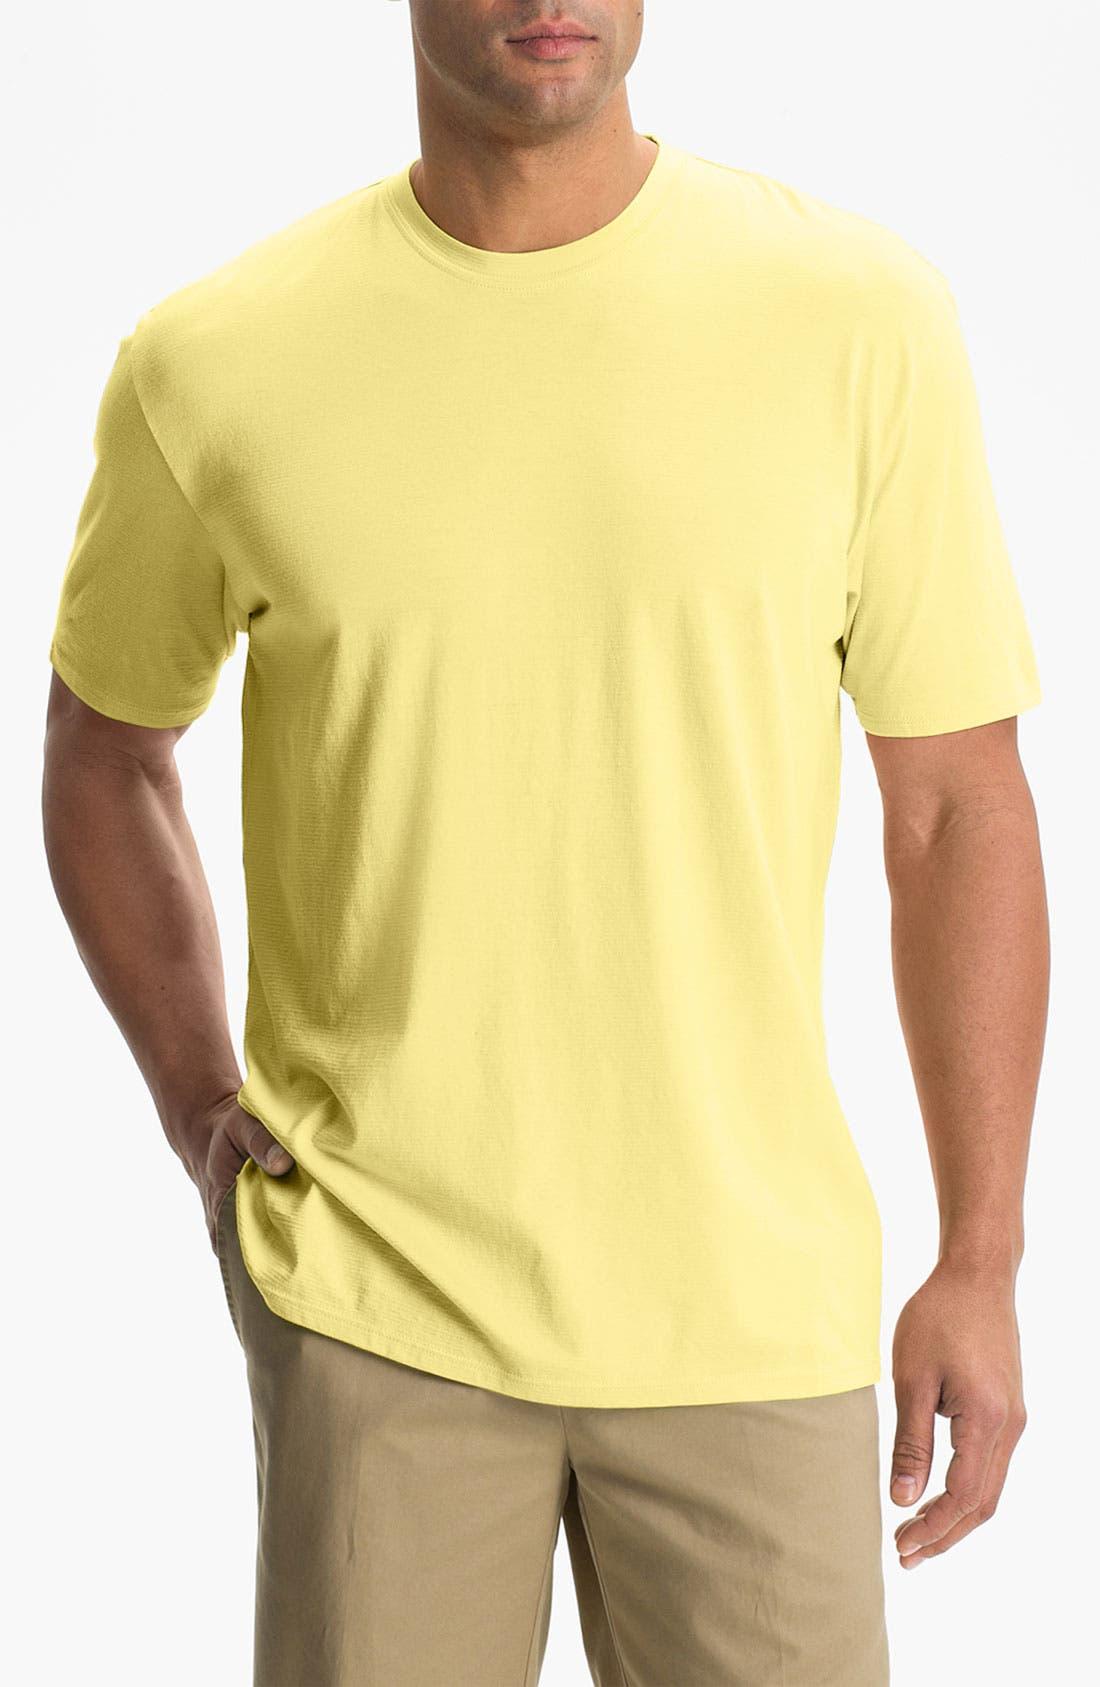 Main Image - Cutter & Buck Crewneck T-Shirt (Big & Tall)